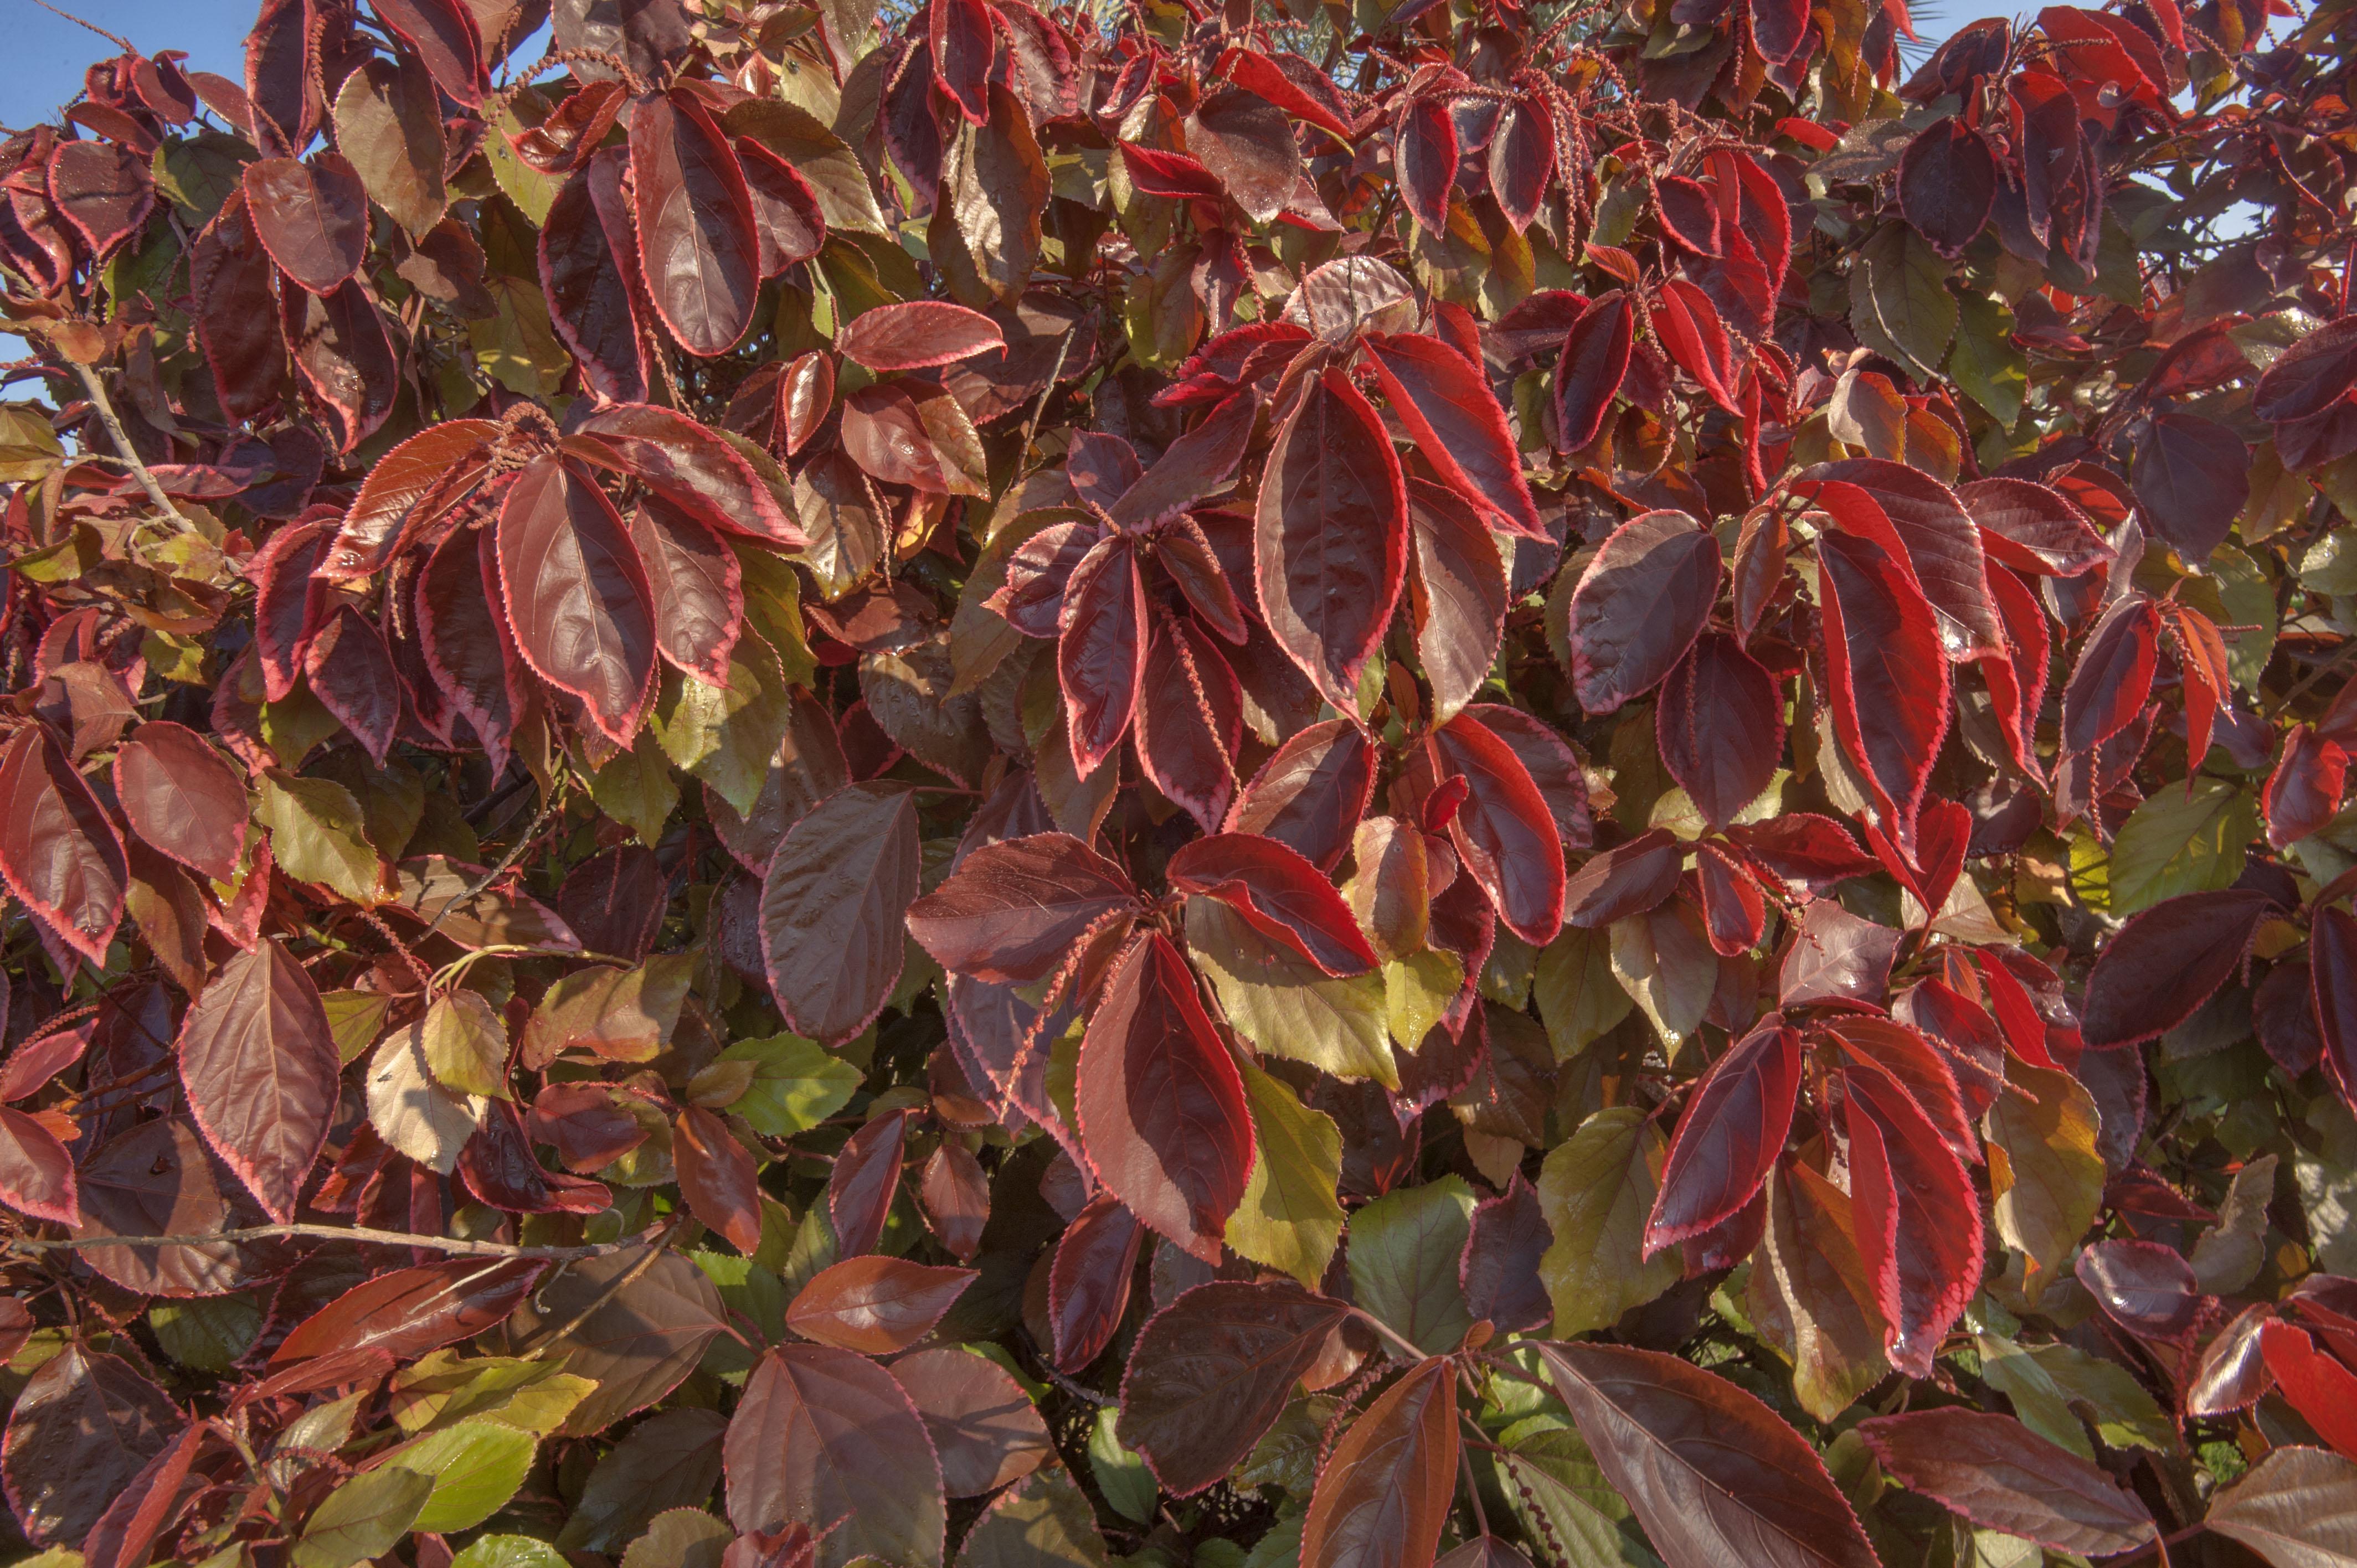 Photo 1730 19 Burgundy Leaves Of Acalypha Wilkesiana Shaped As